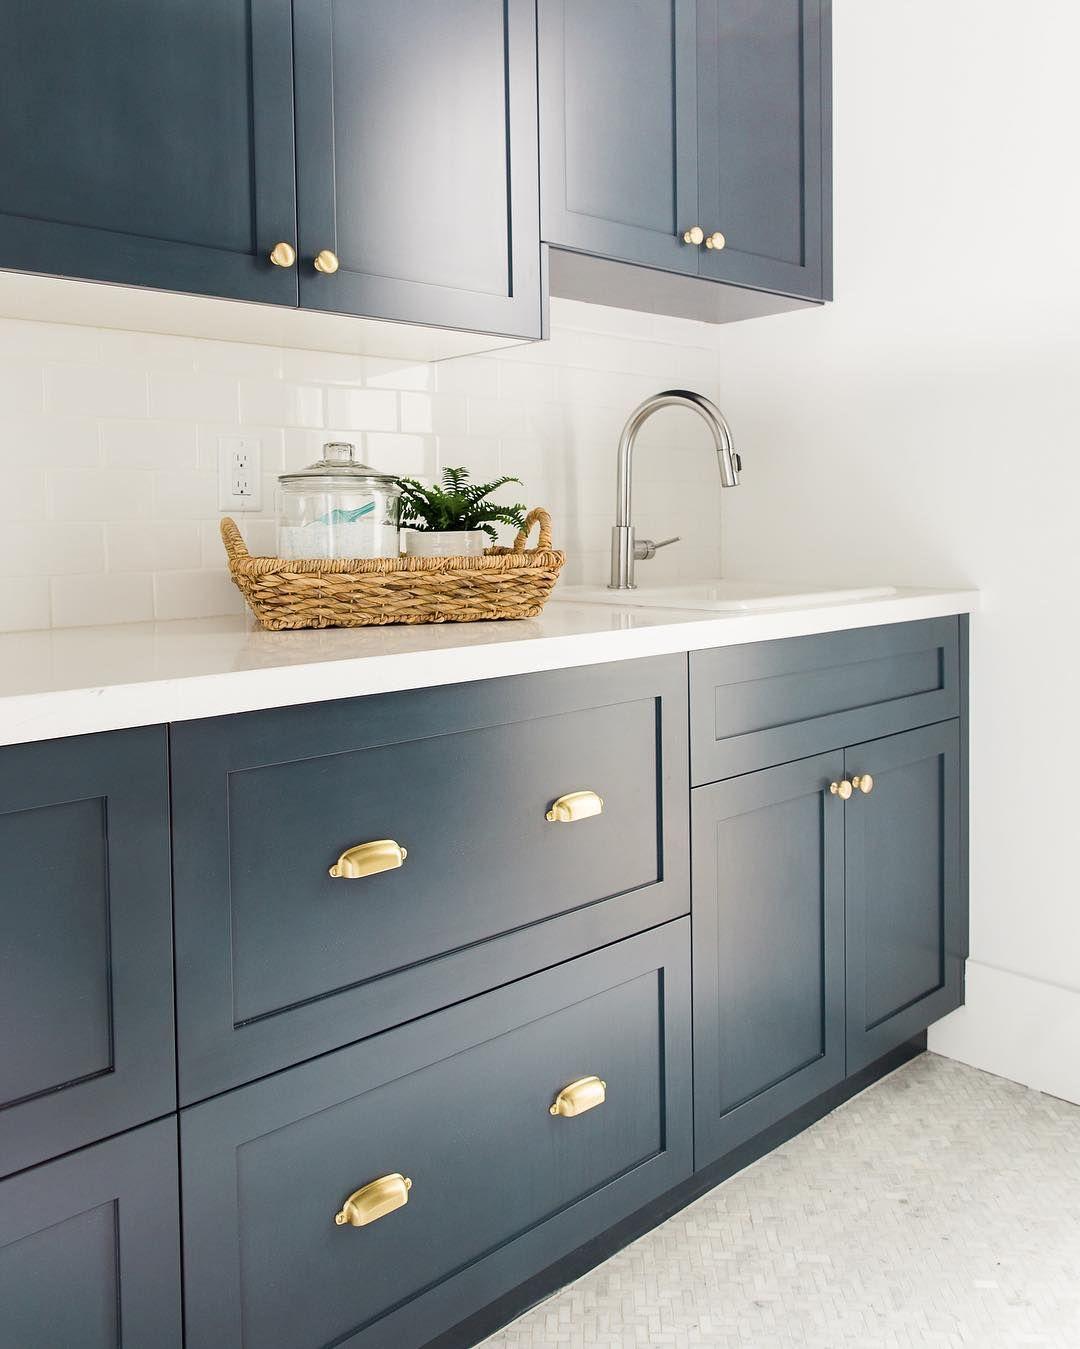 Kabinart Kitchen Cabinets: Bm Hale Navy, Pure White Caesarstone Countertops, Brass